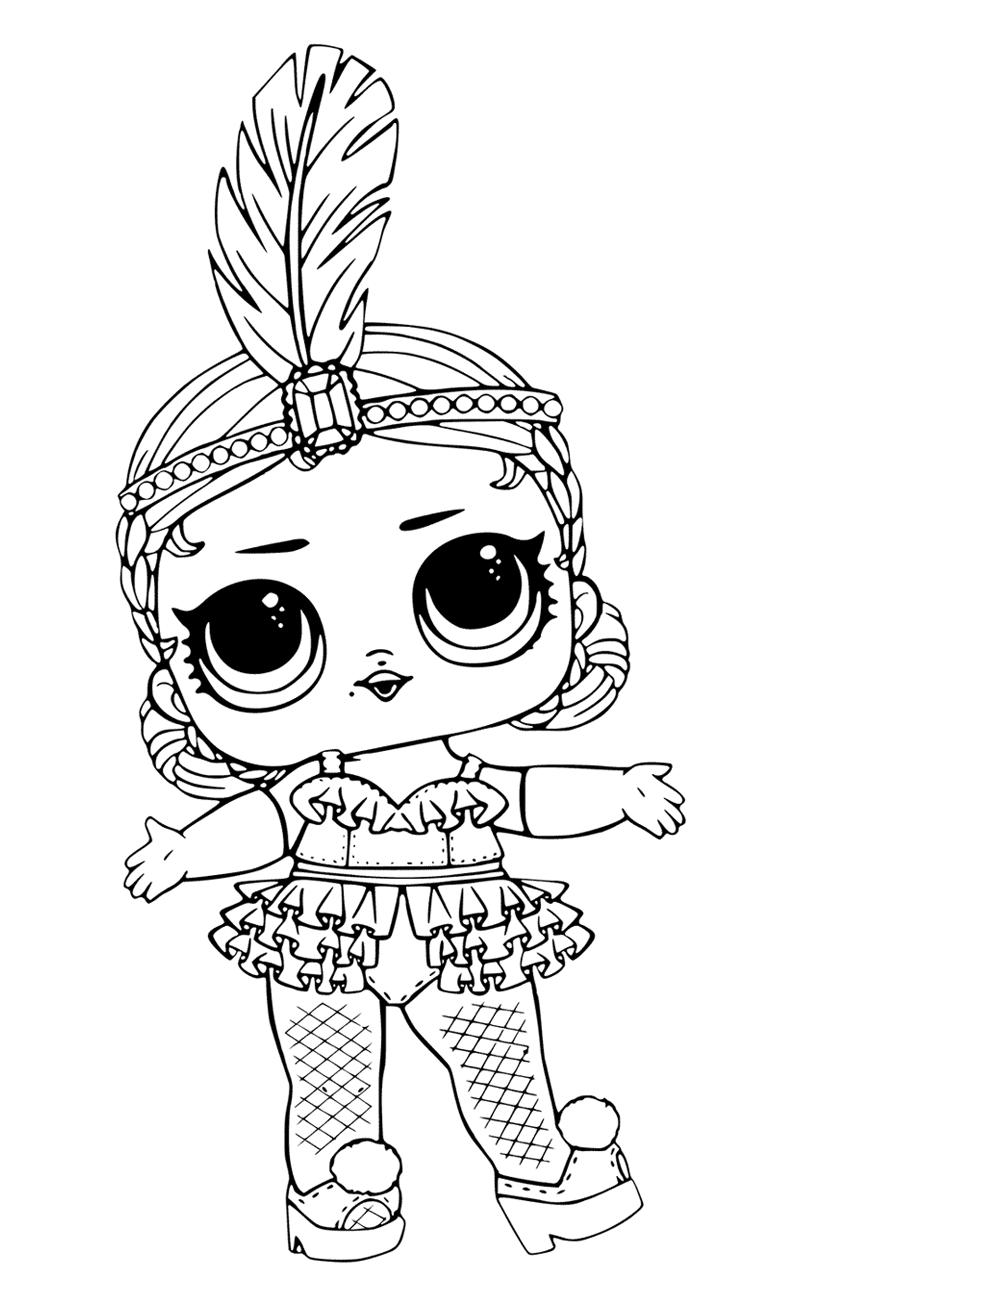 Кукла ЛОЛ шоу беби - Куклы LOL - Раскраски антистресс